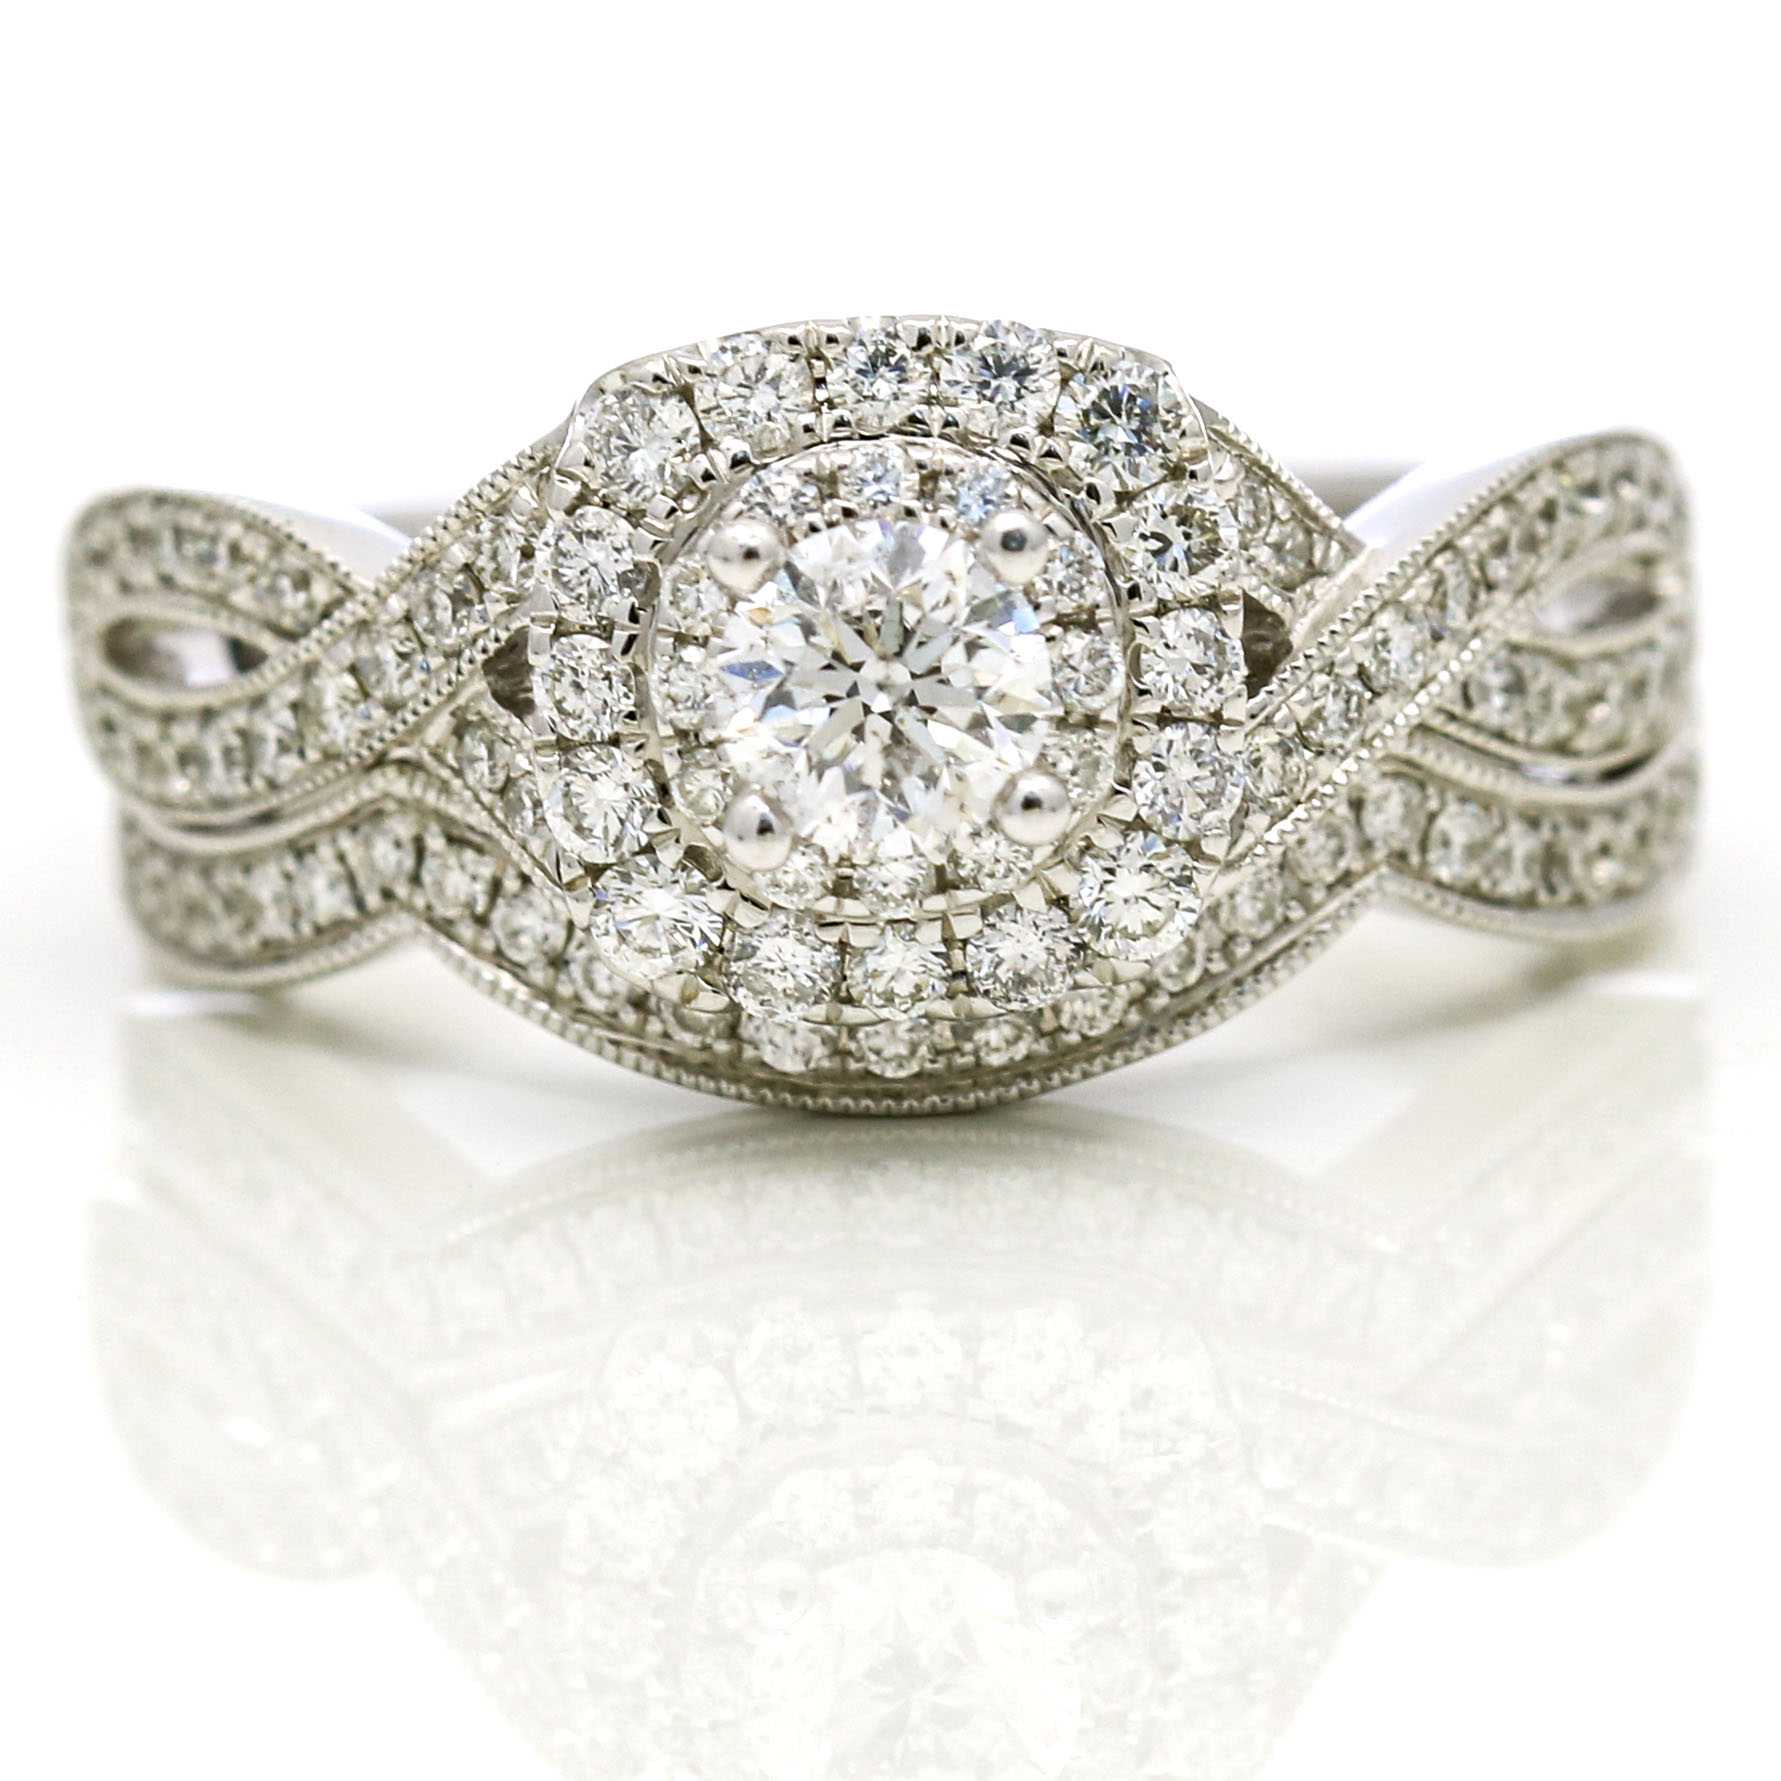 Neil Lane Diamond Engagement Ring And Wedding Band Set In 14k White Gold Ebay